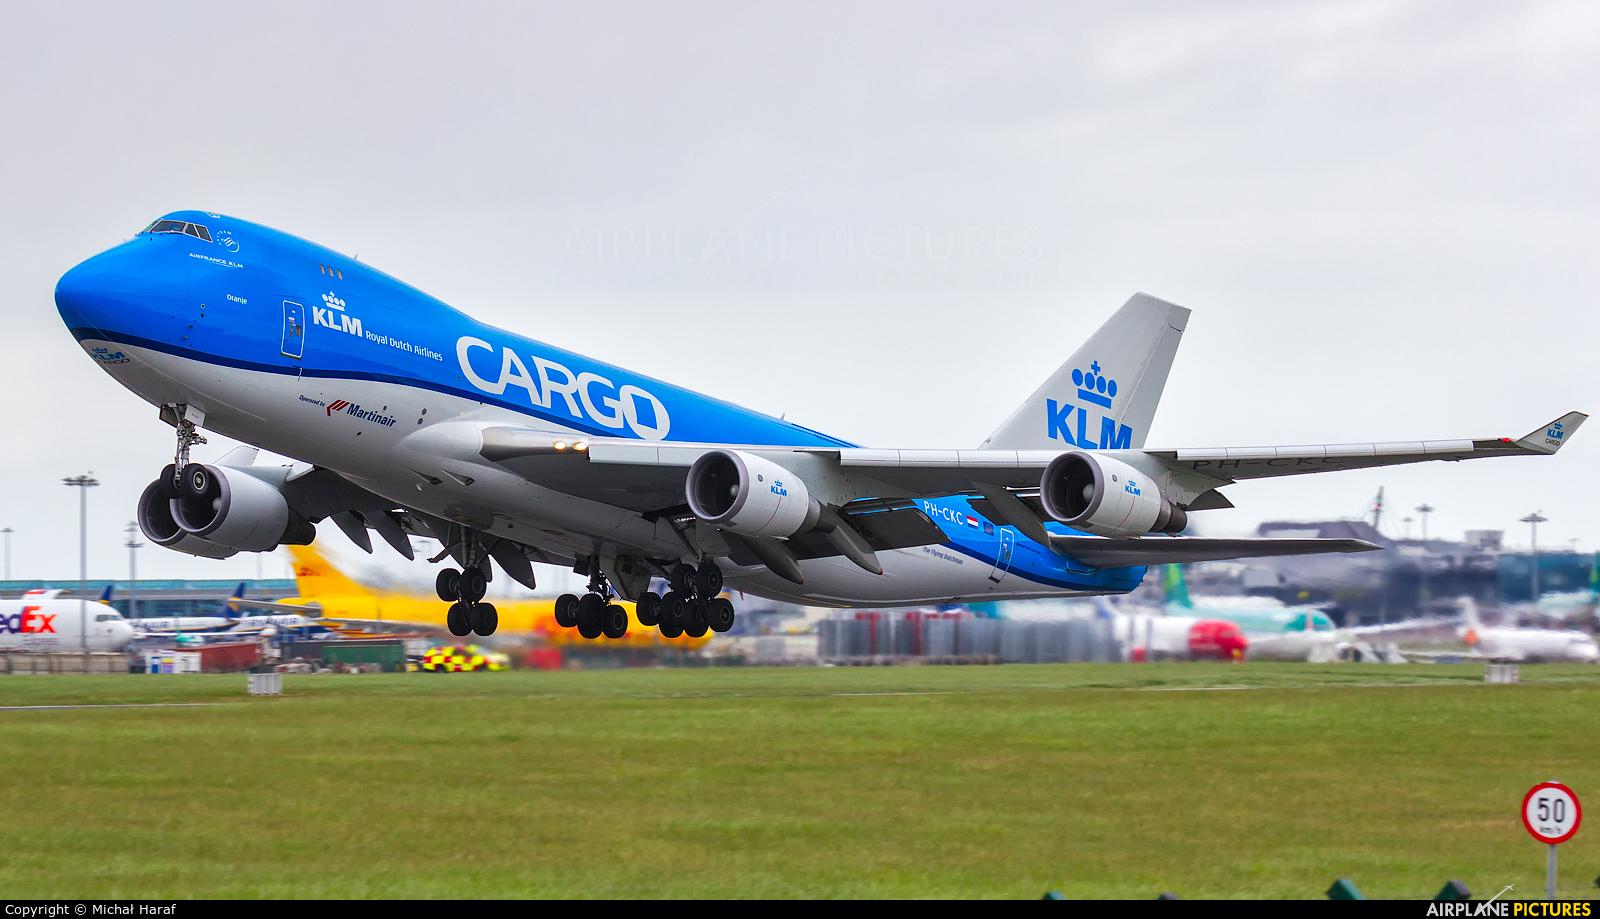 KLM Cargo PH-CKC aircraft at Dublin